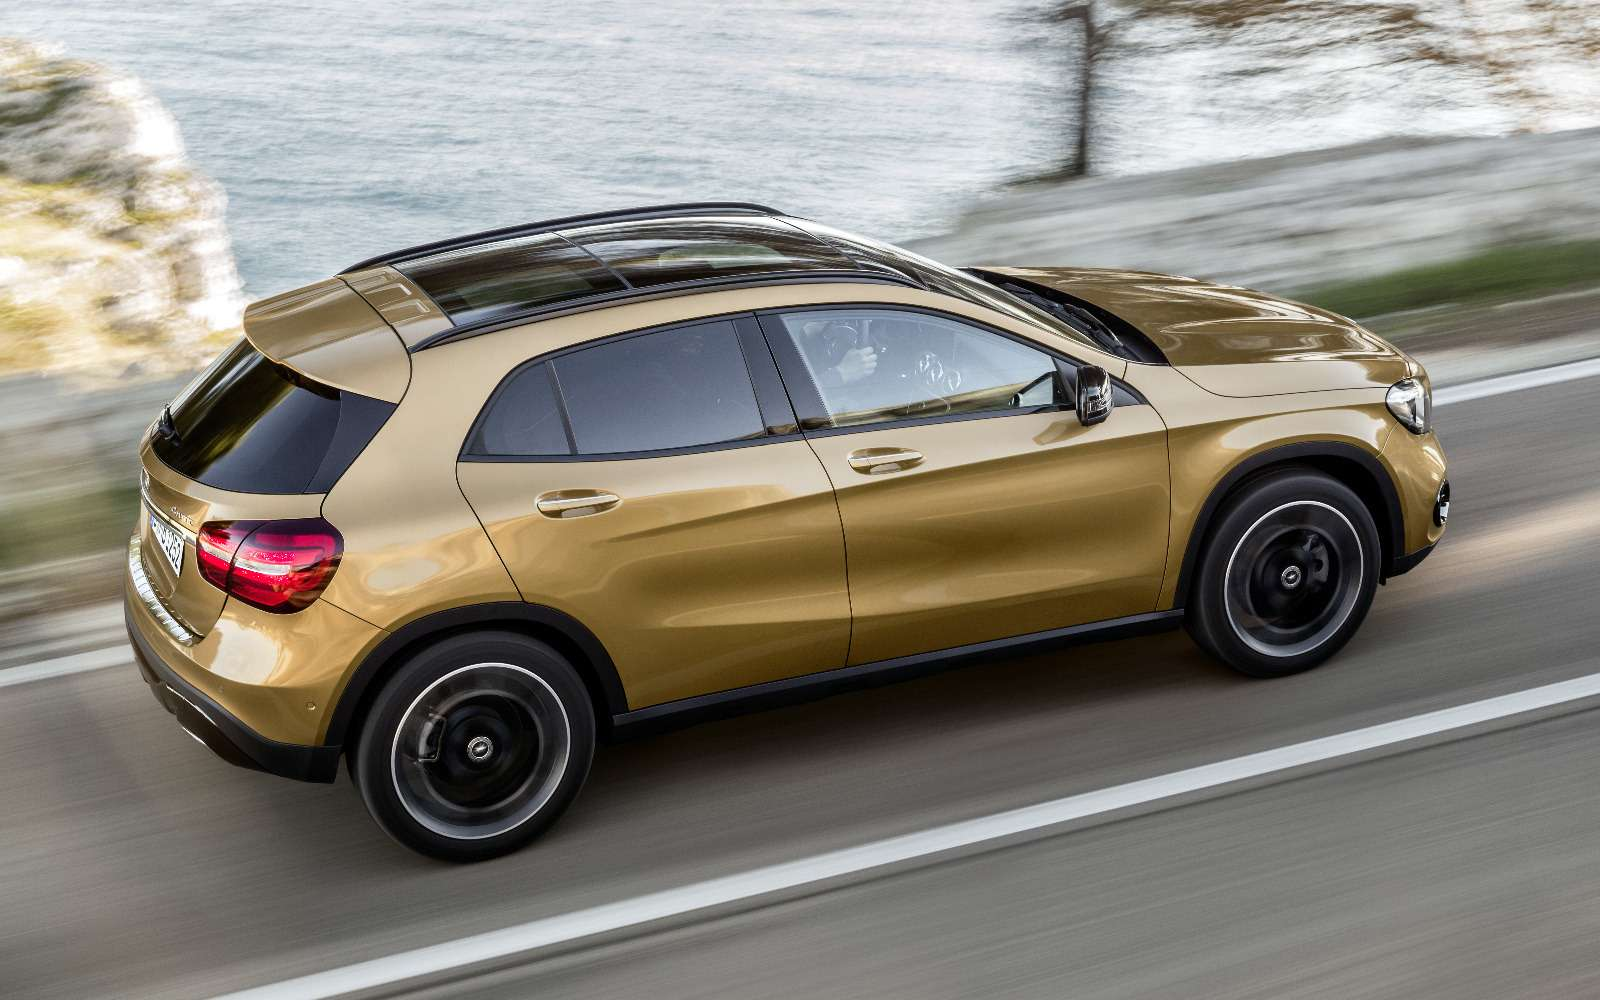 Mercedes-Benz GLA стал краше, нонепросторнее— фото 690067